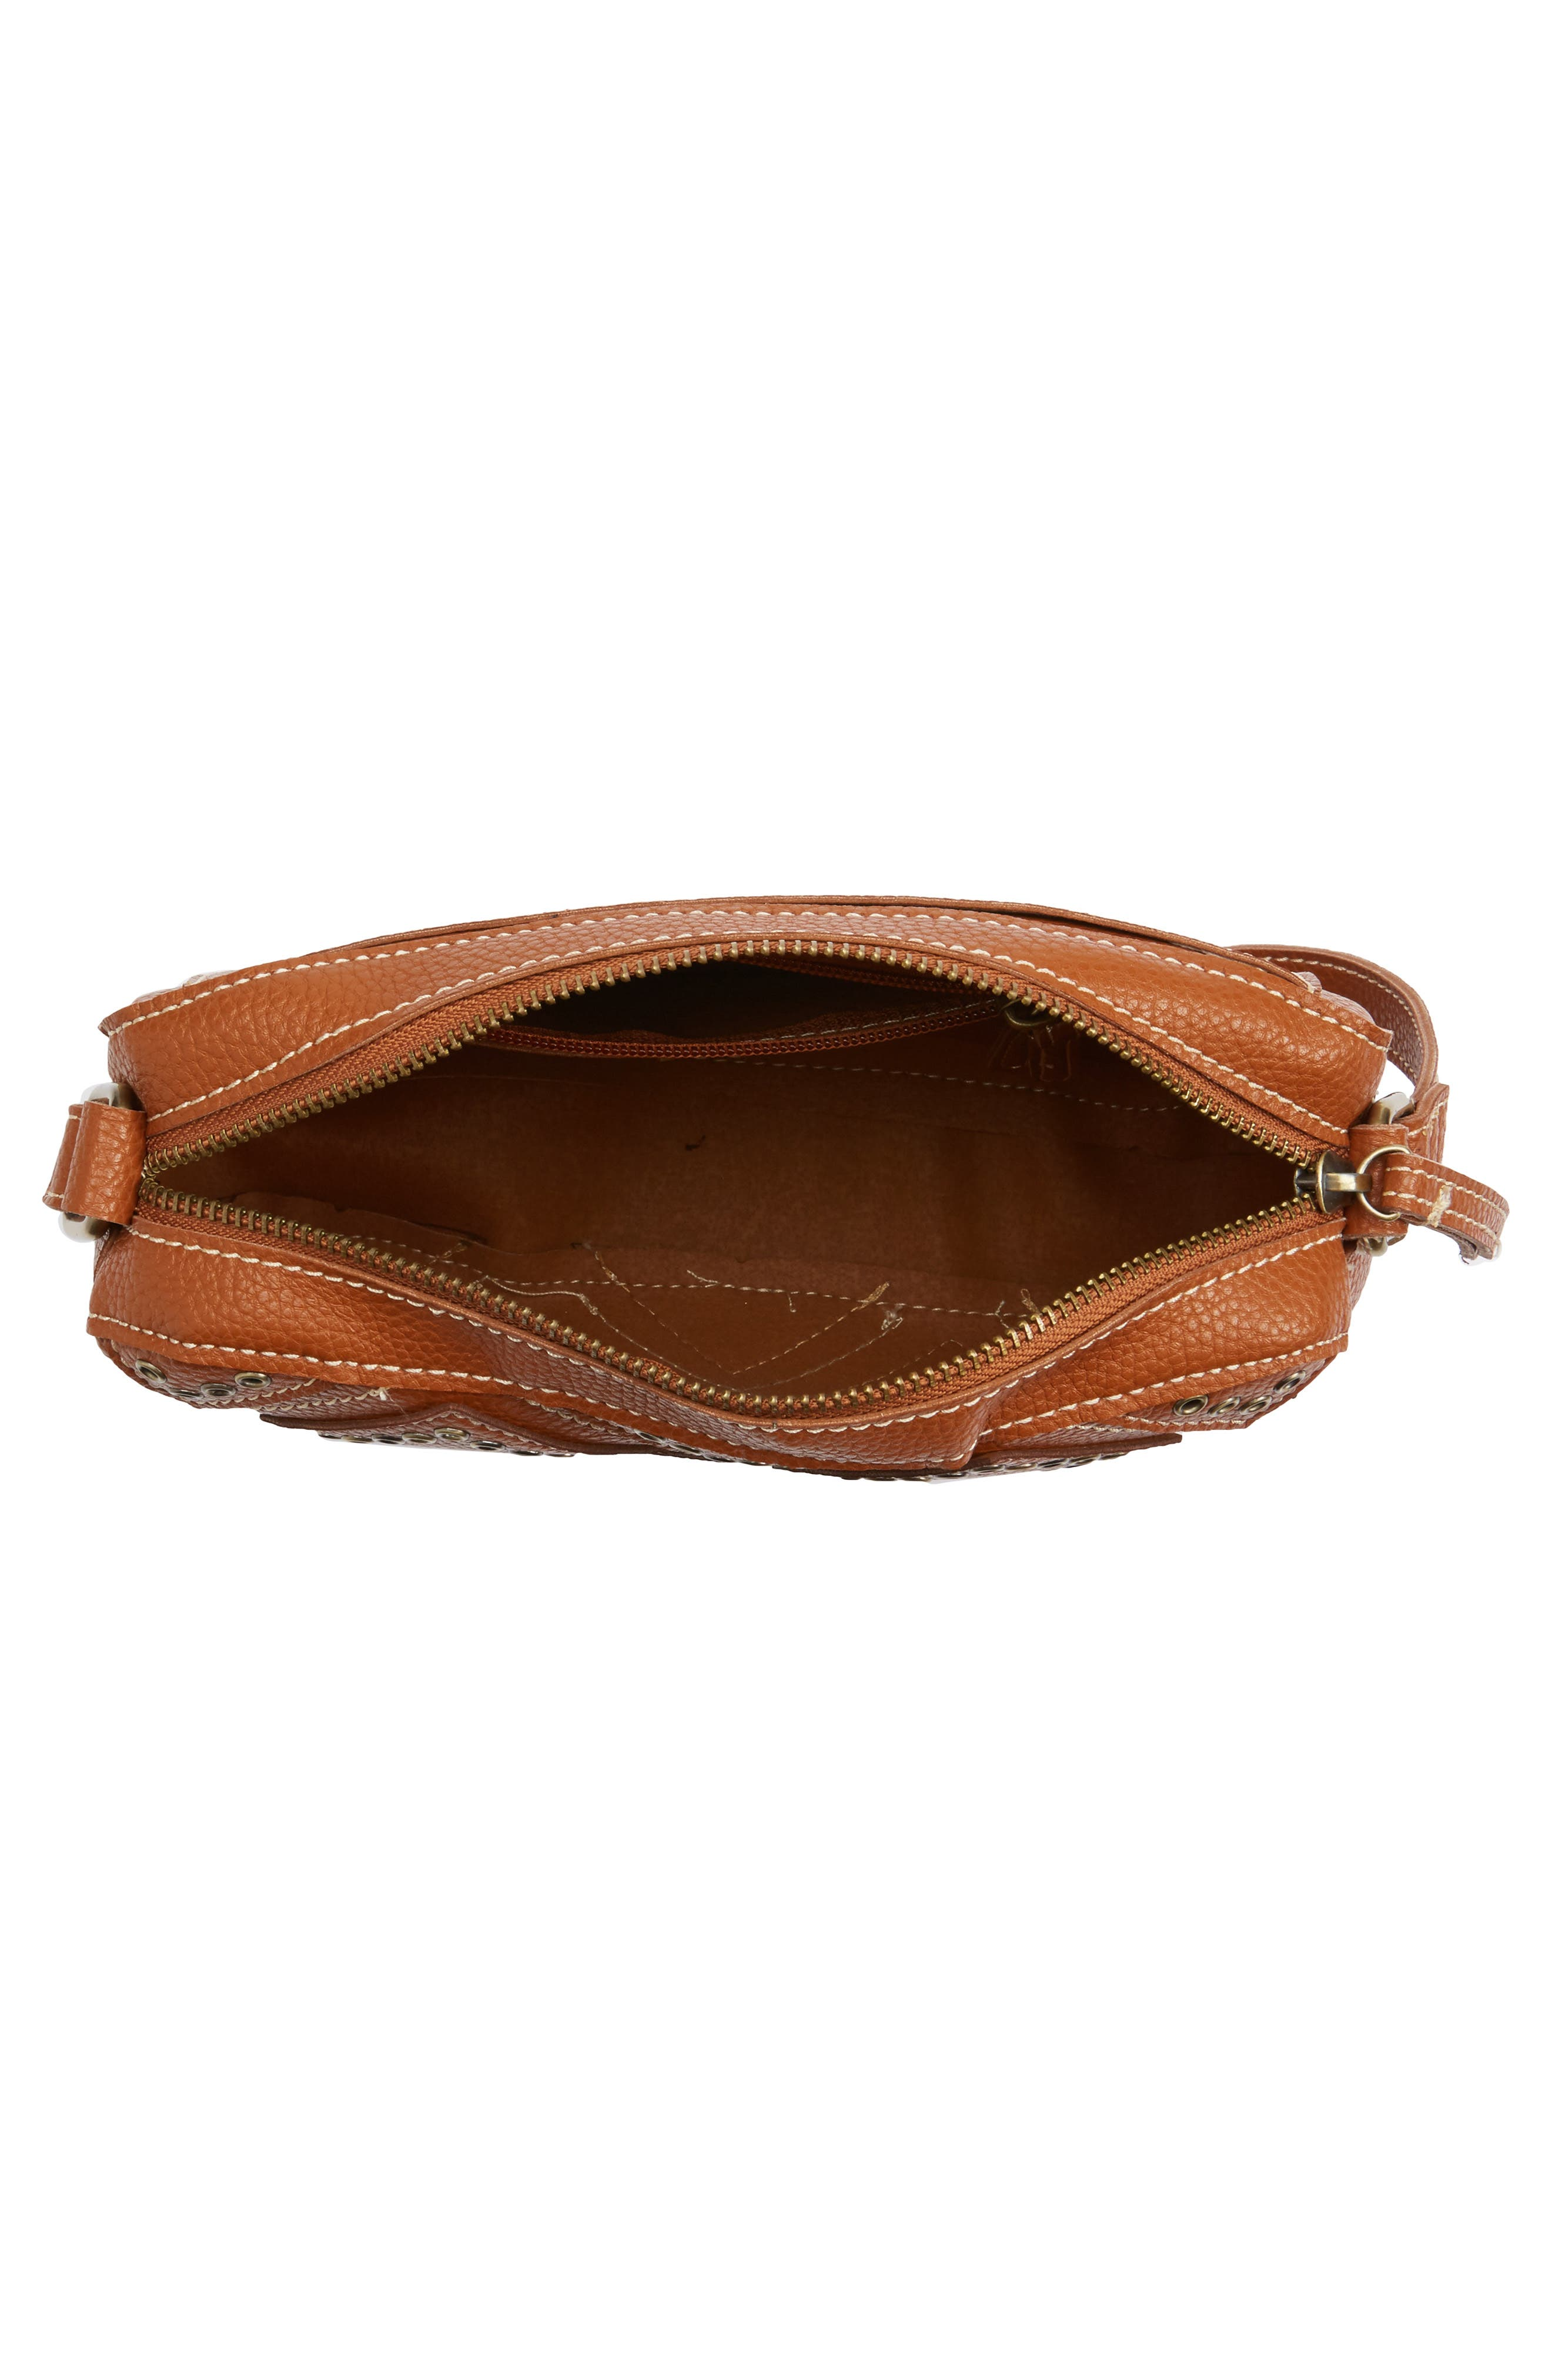 Skylar Faux Leather Crossbody Bag,                             Alternate thumbnail 4, color,                             211